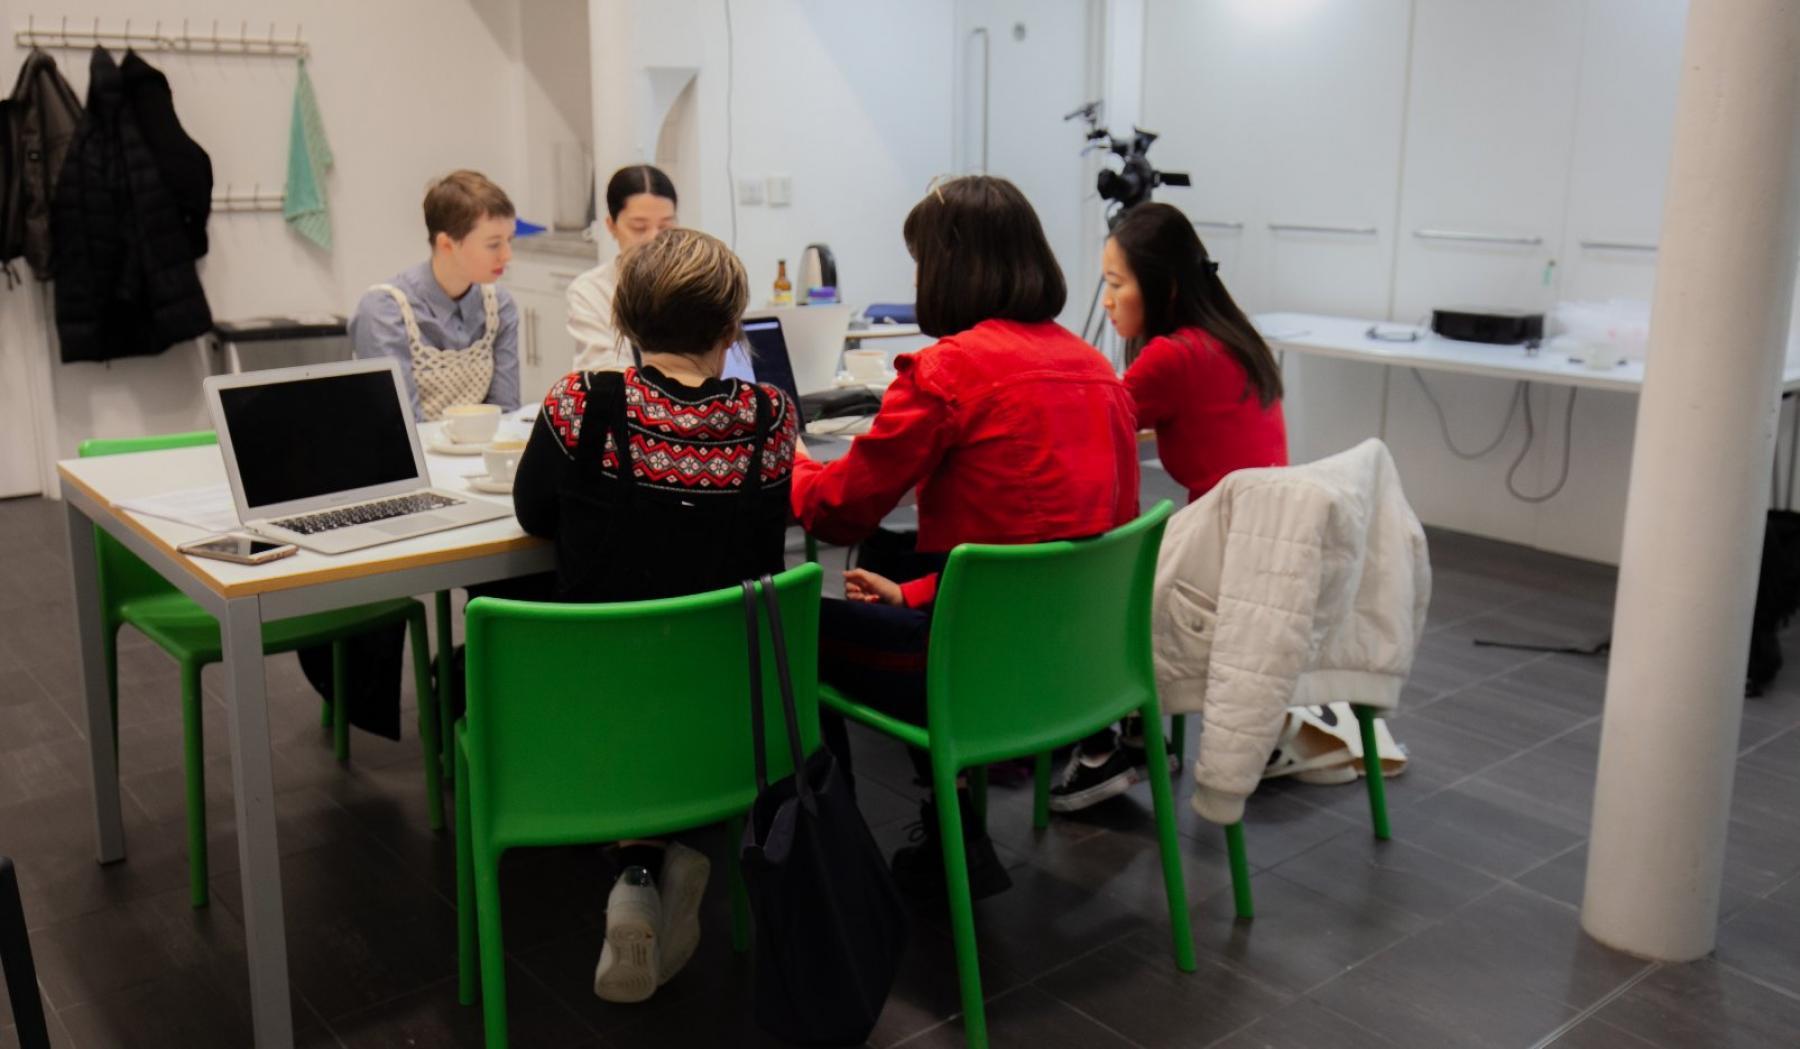 participants discuss ideas at Aspex's Collective Futures Workshop